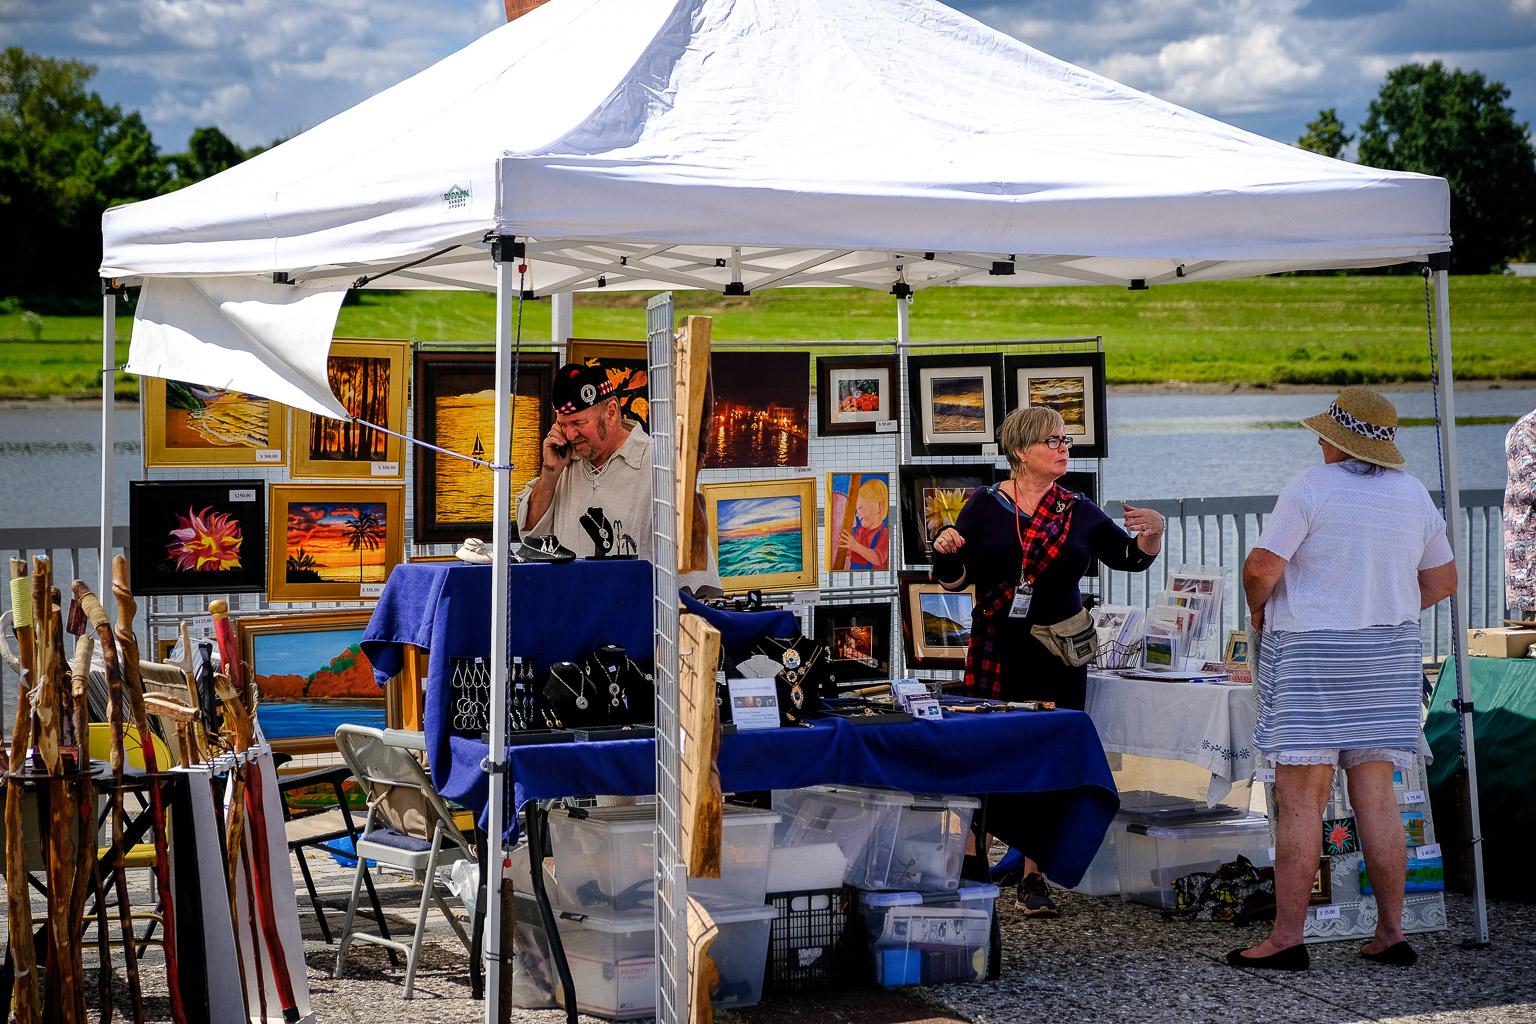 Waterfront_Art_Festival_2017-051-Lenzy-Ruffin-Event-Photography-Washington-DC-Fuji-X-T2.jpg